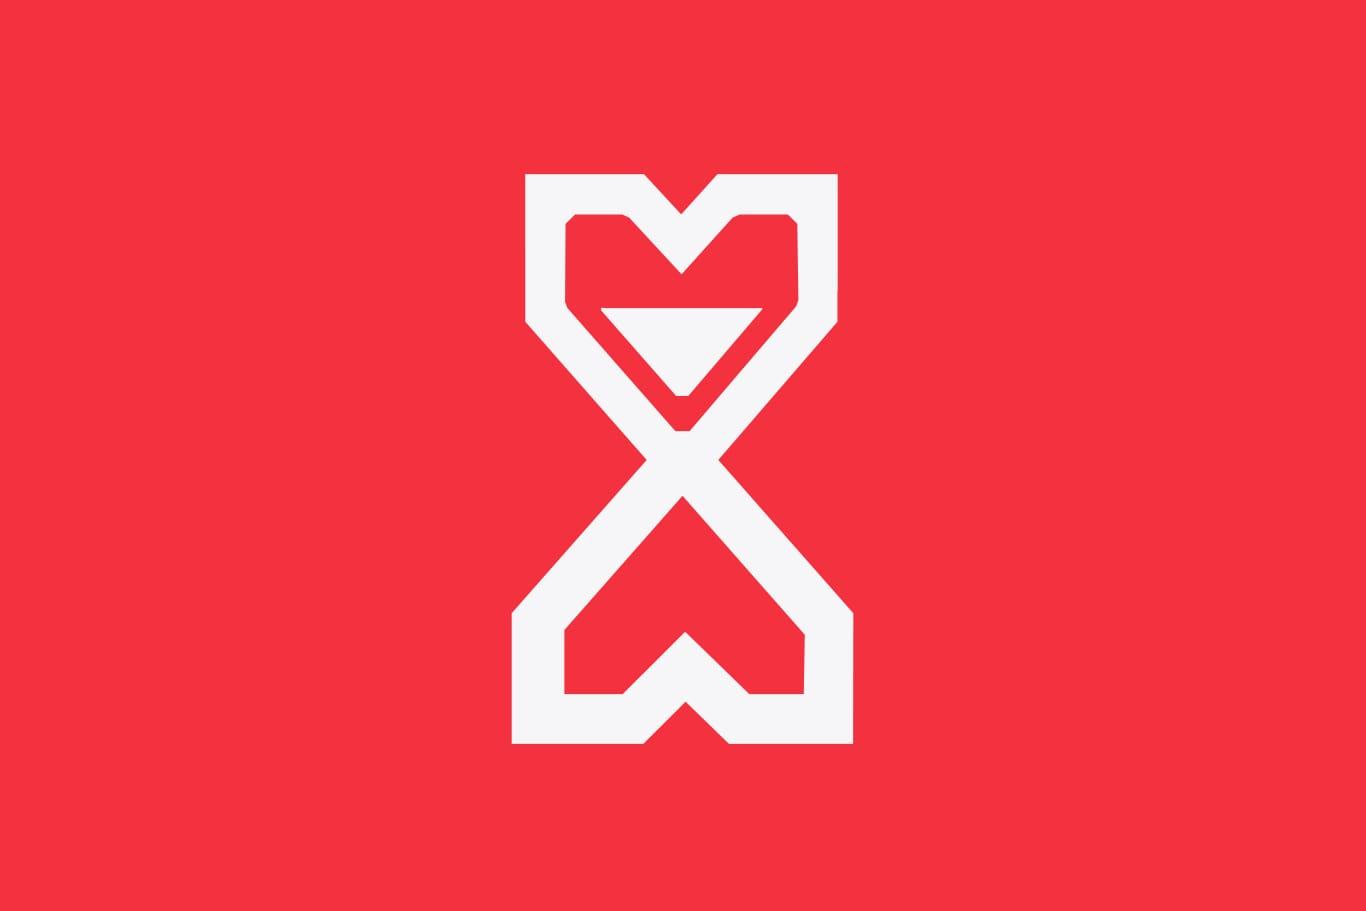 Proyecto de naming, branding y Packaging para Reanimax